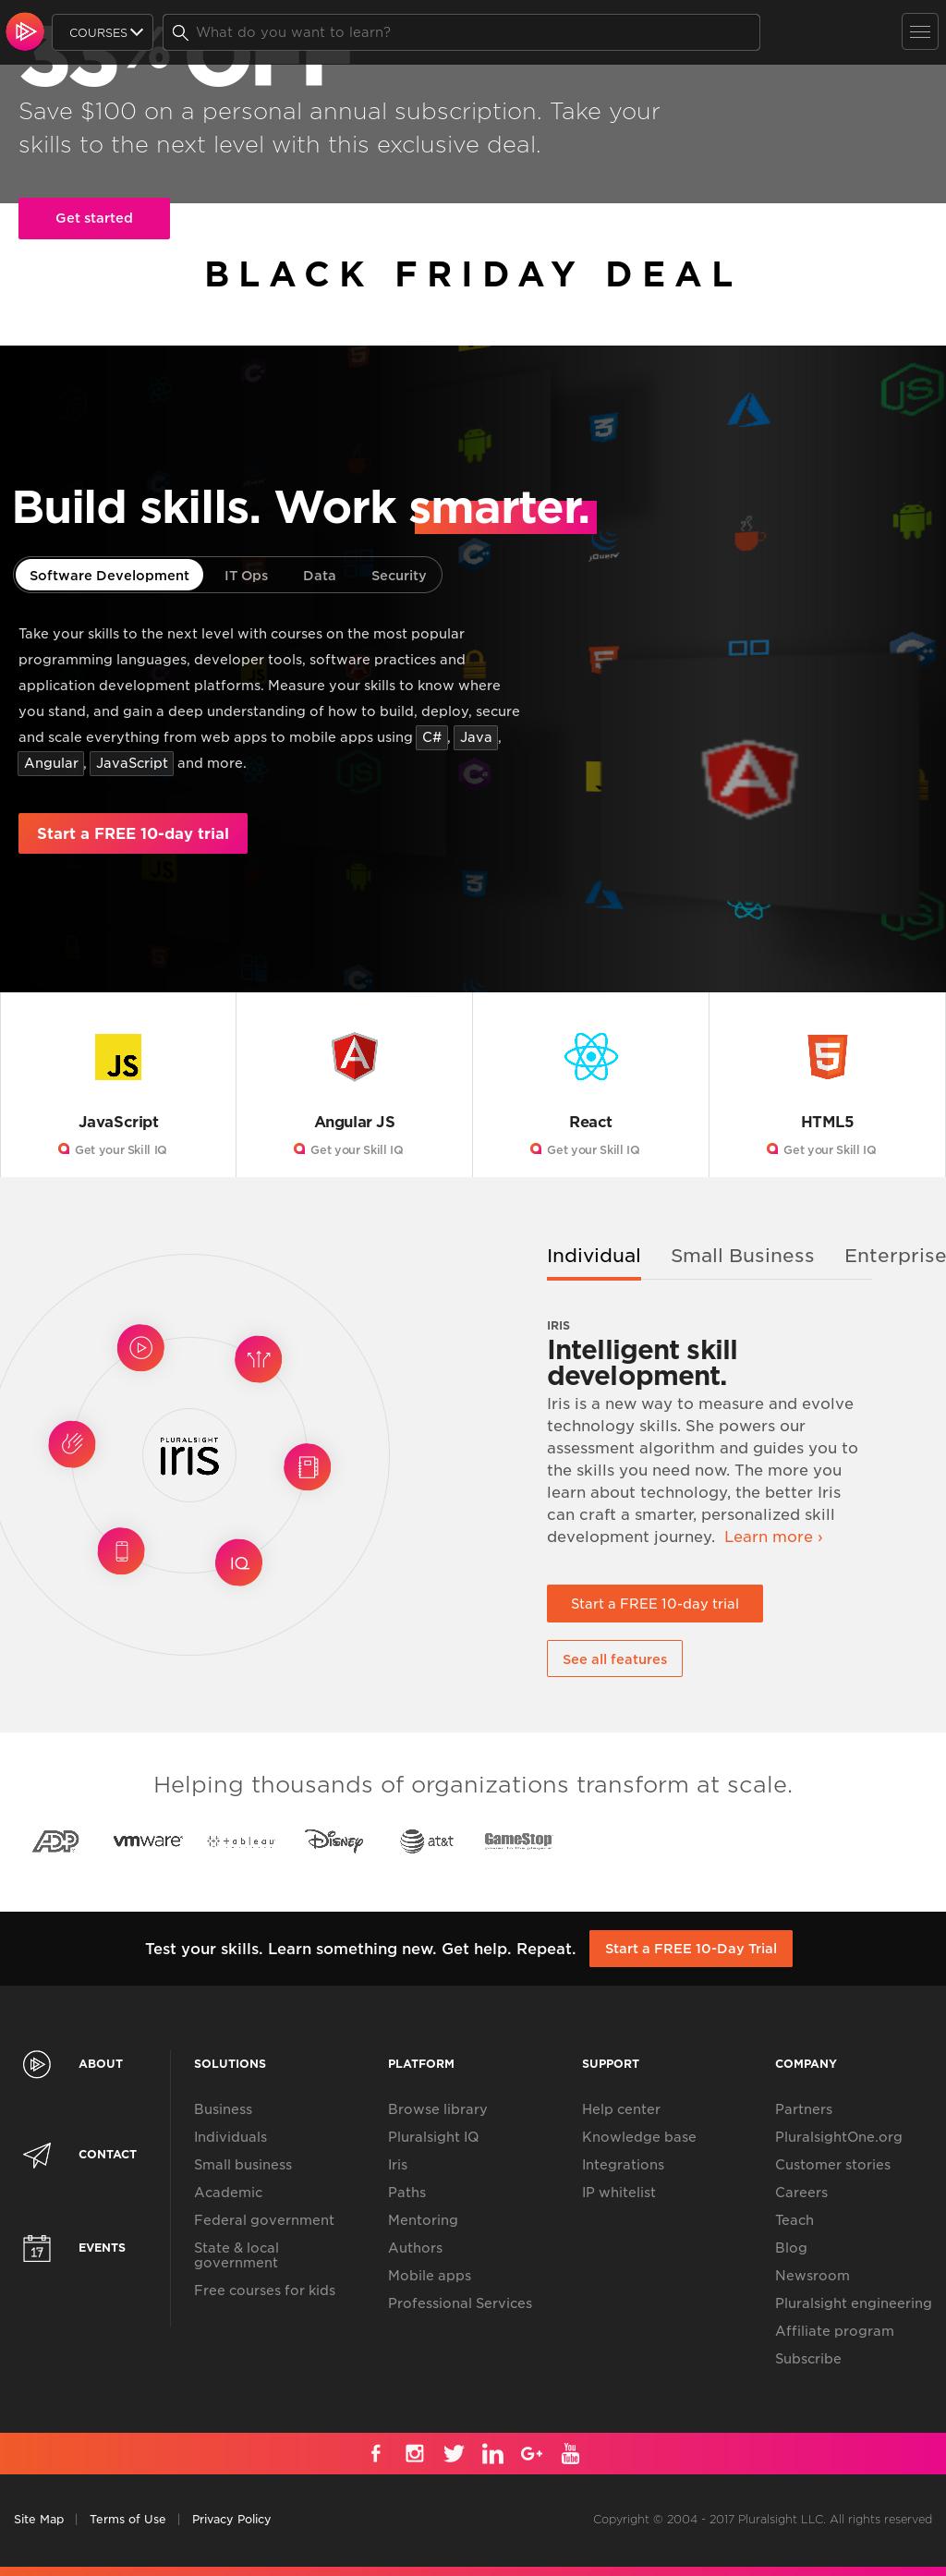 Pluralsight Competitors, Revenue and Employees - Owler Company Profile